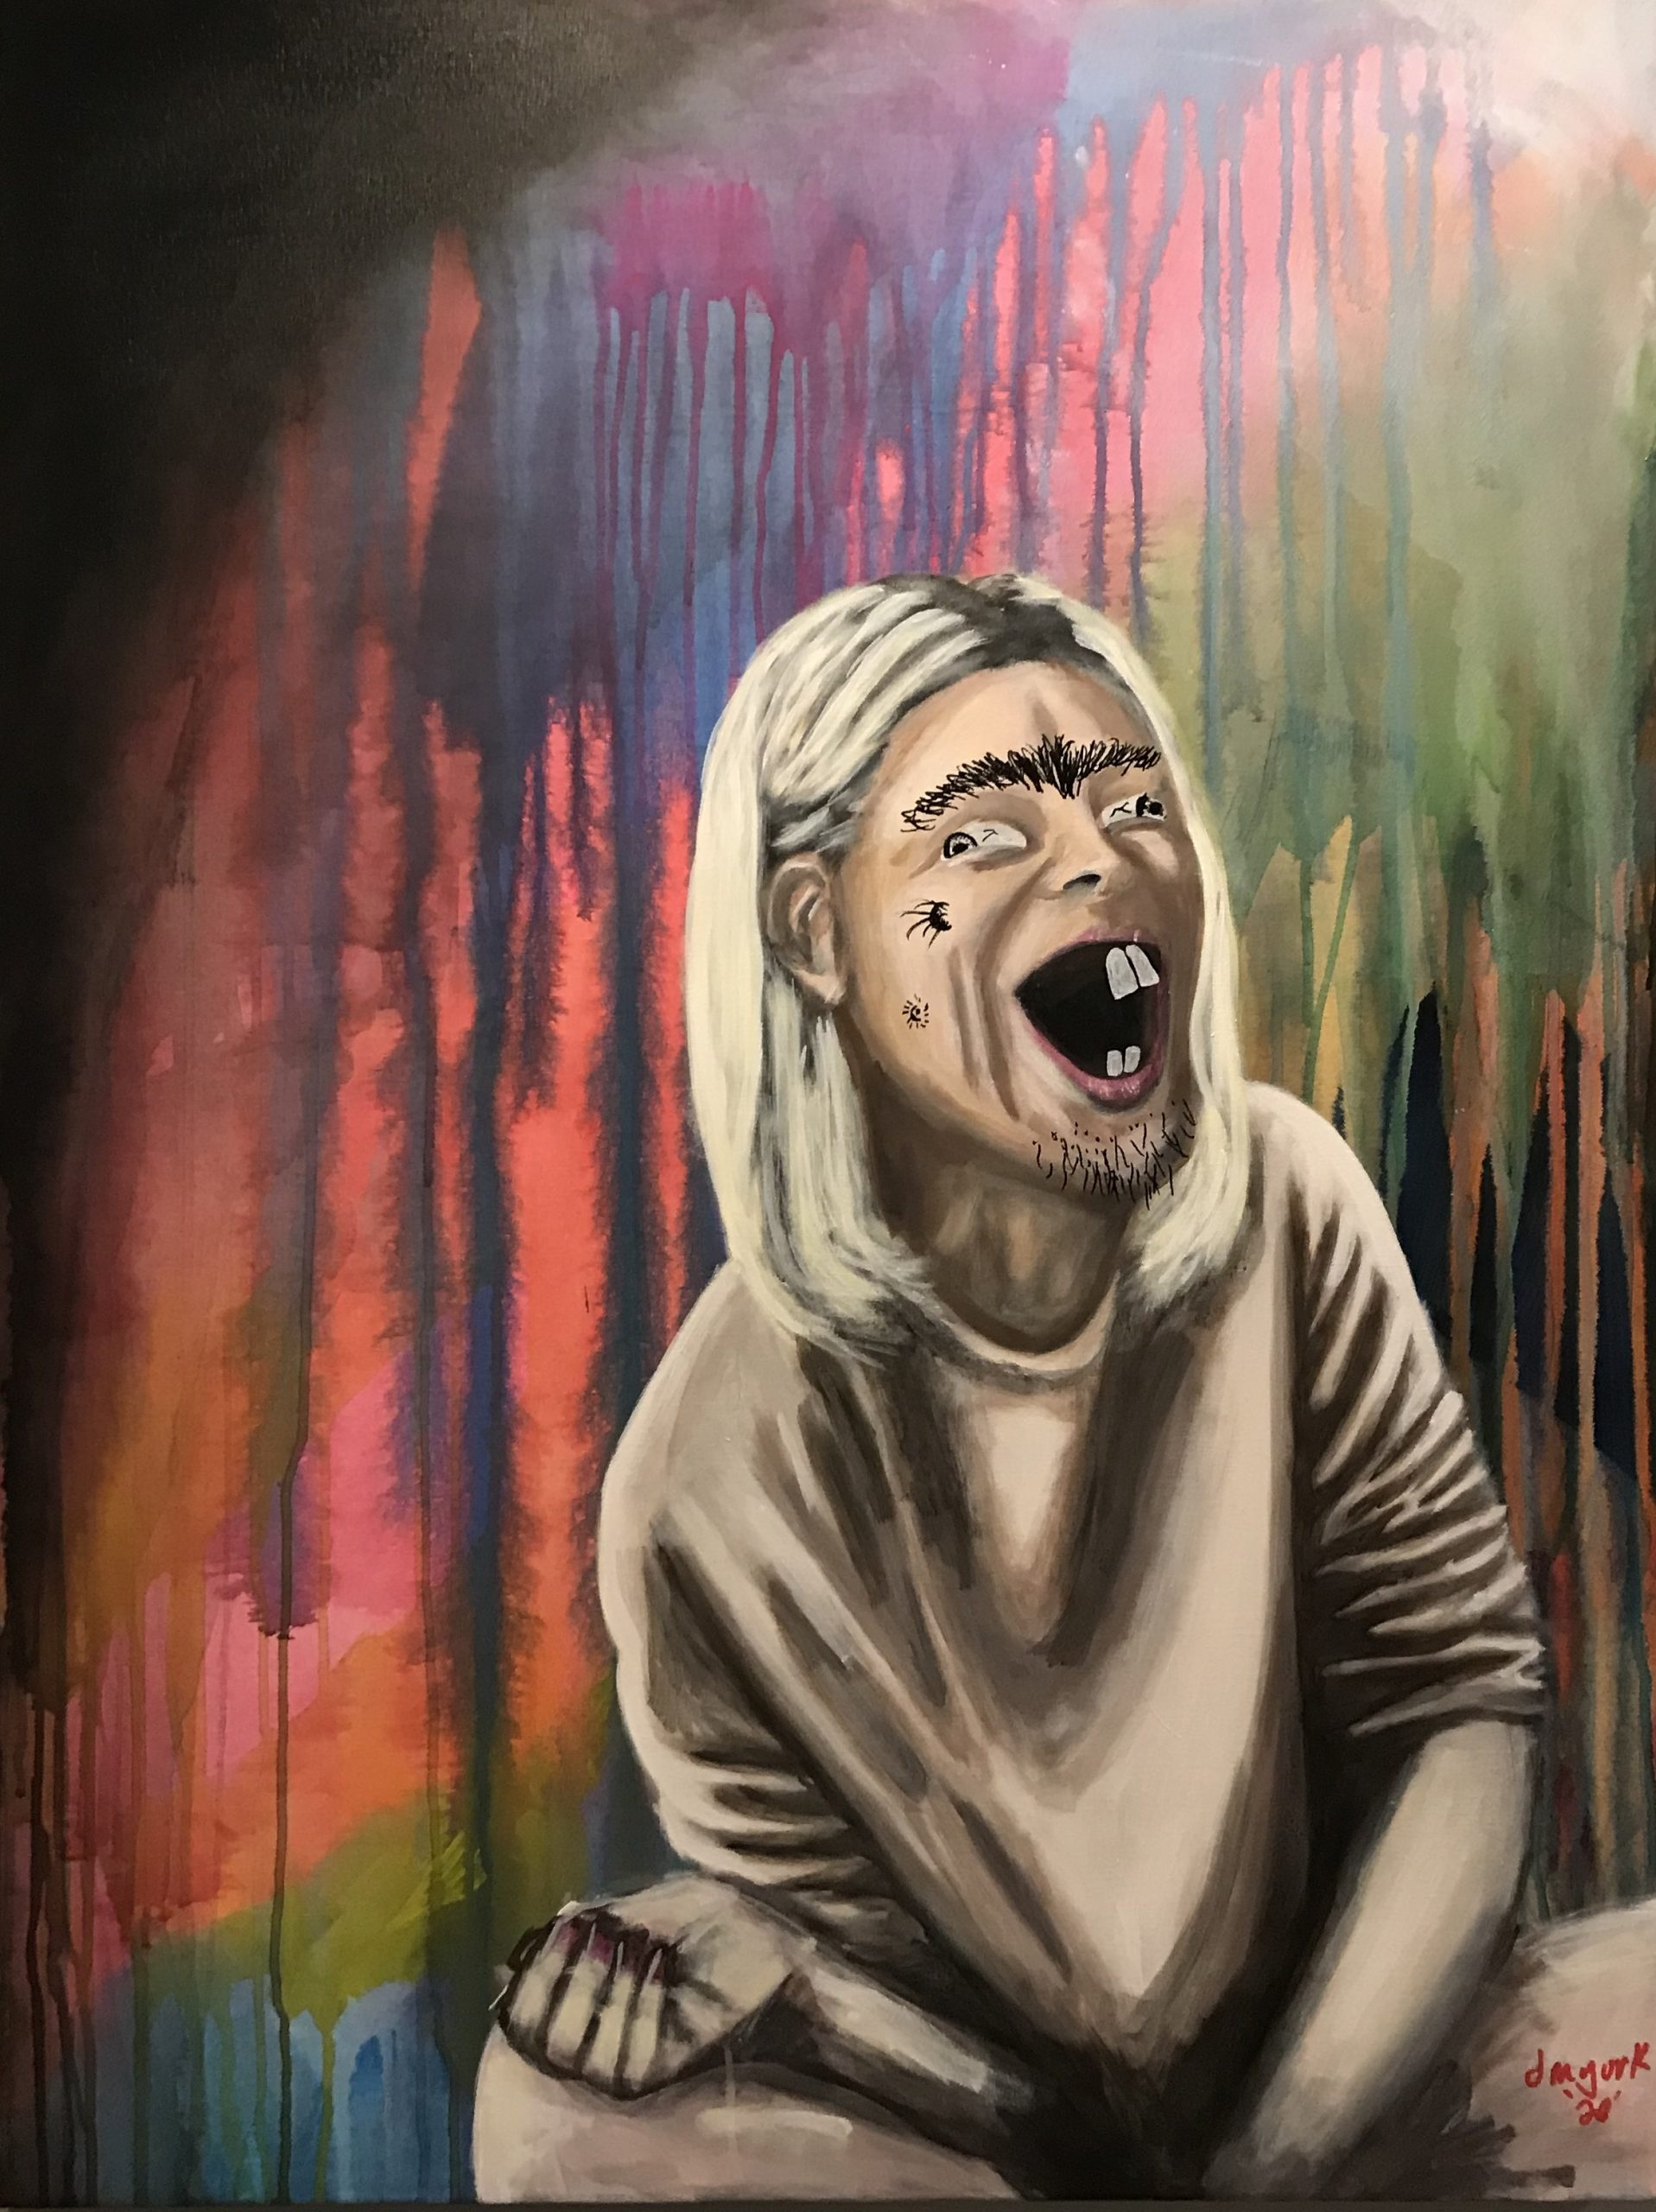 daniel-matthew-york-delusionism-13